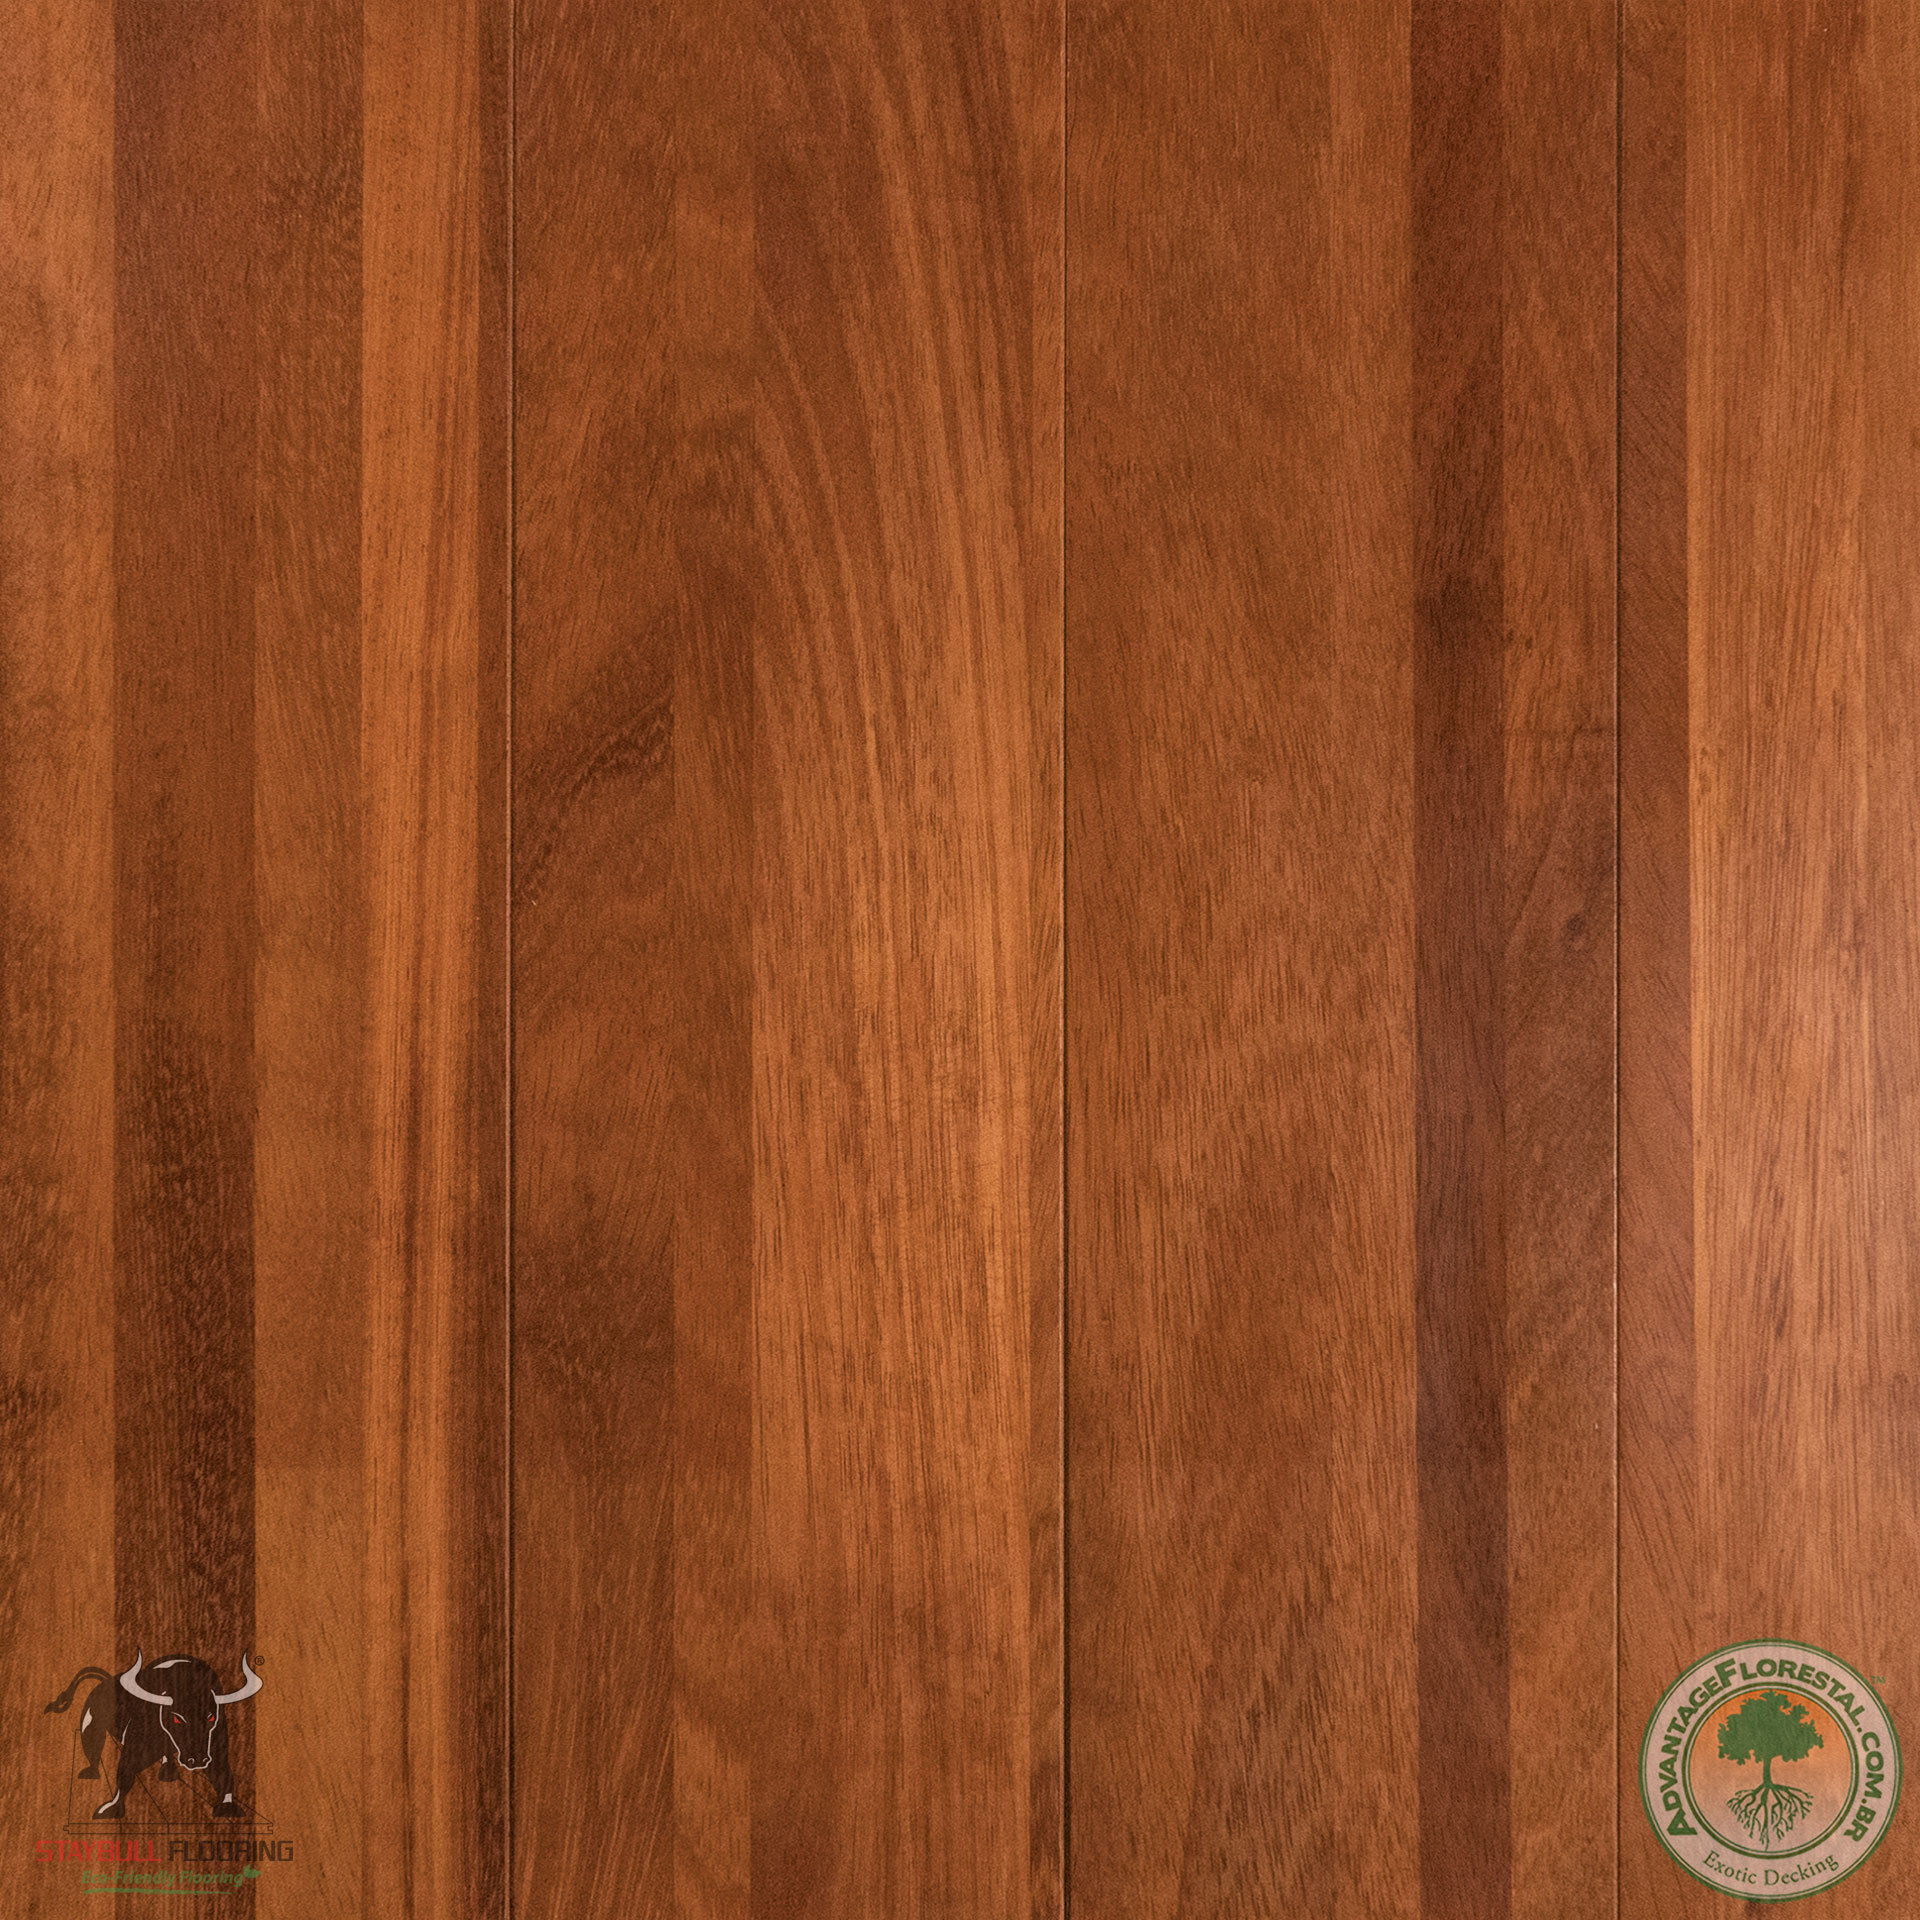 Wholesale StayBull Iroko Hardwood Flooring